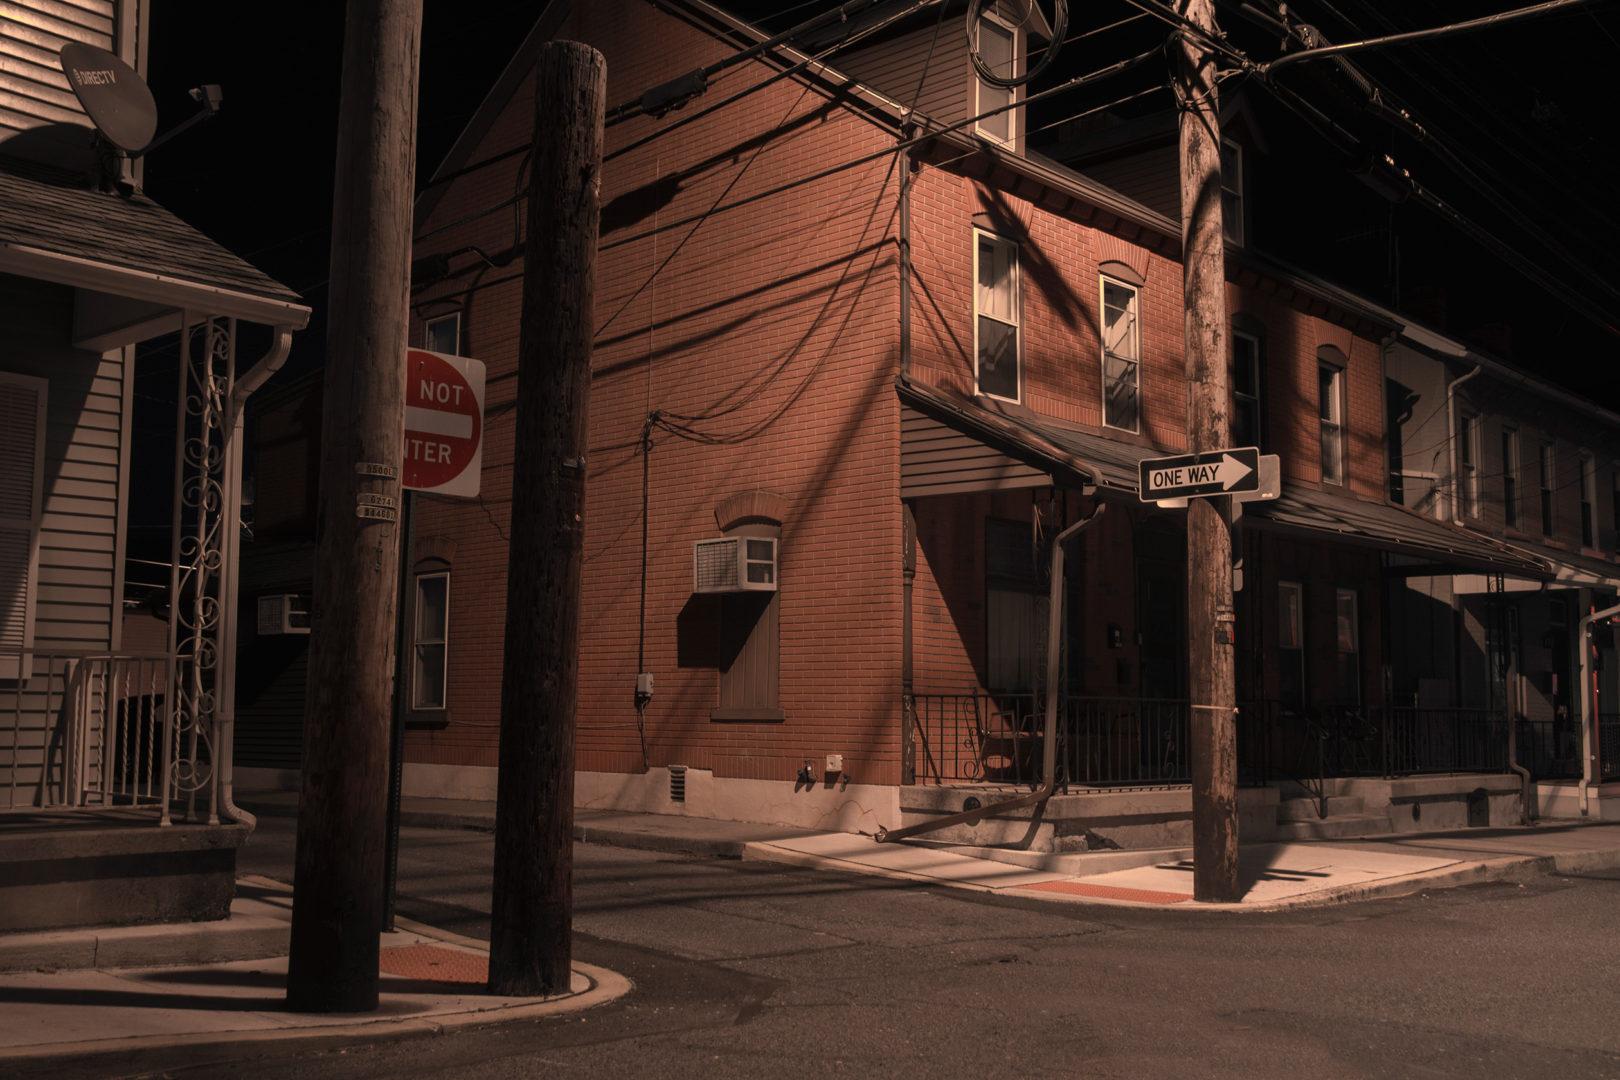 Alley in Emmaus Pennsylvania